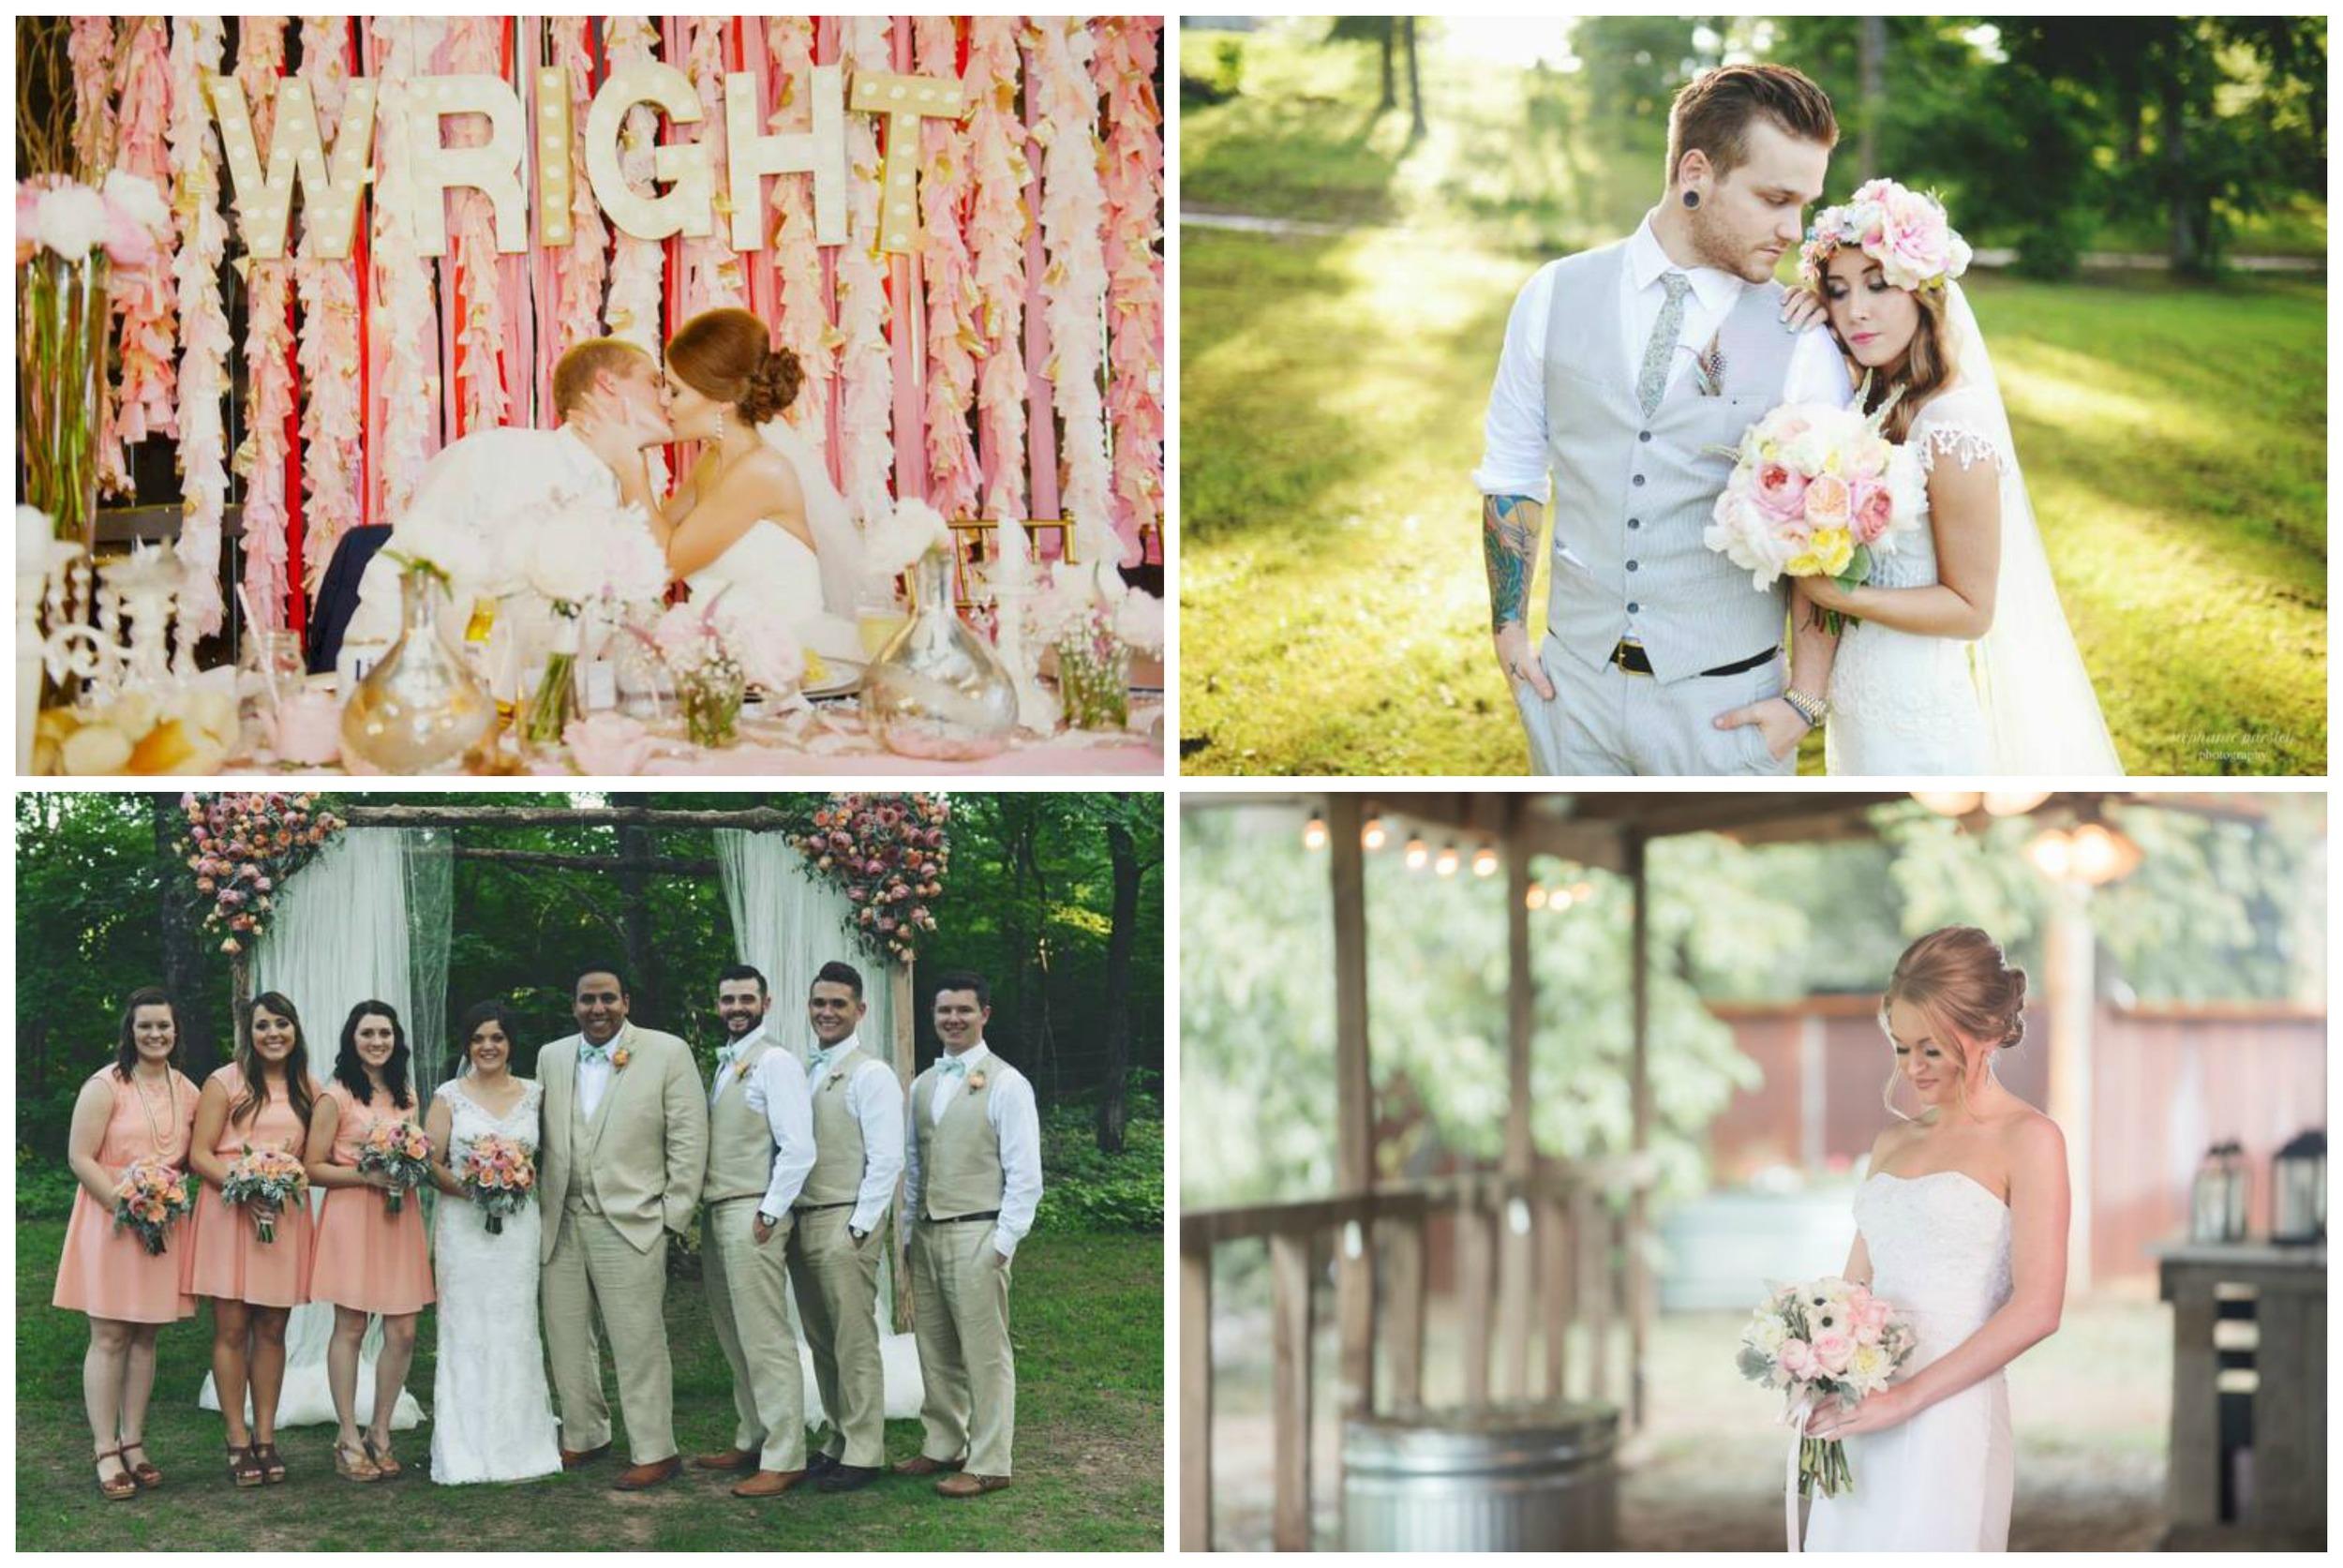 Melissa McCrotty Photography ;  Stephanie Parsley Photography ;  Andrew Arceri ;  Elmer Escobar